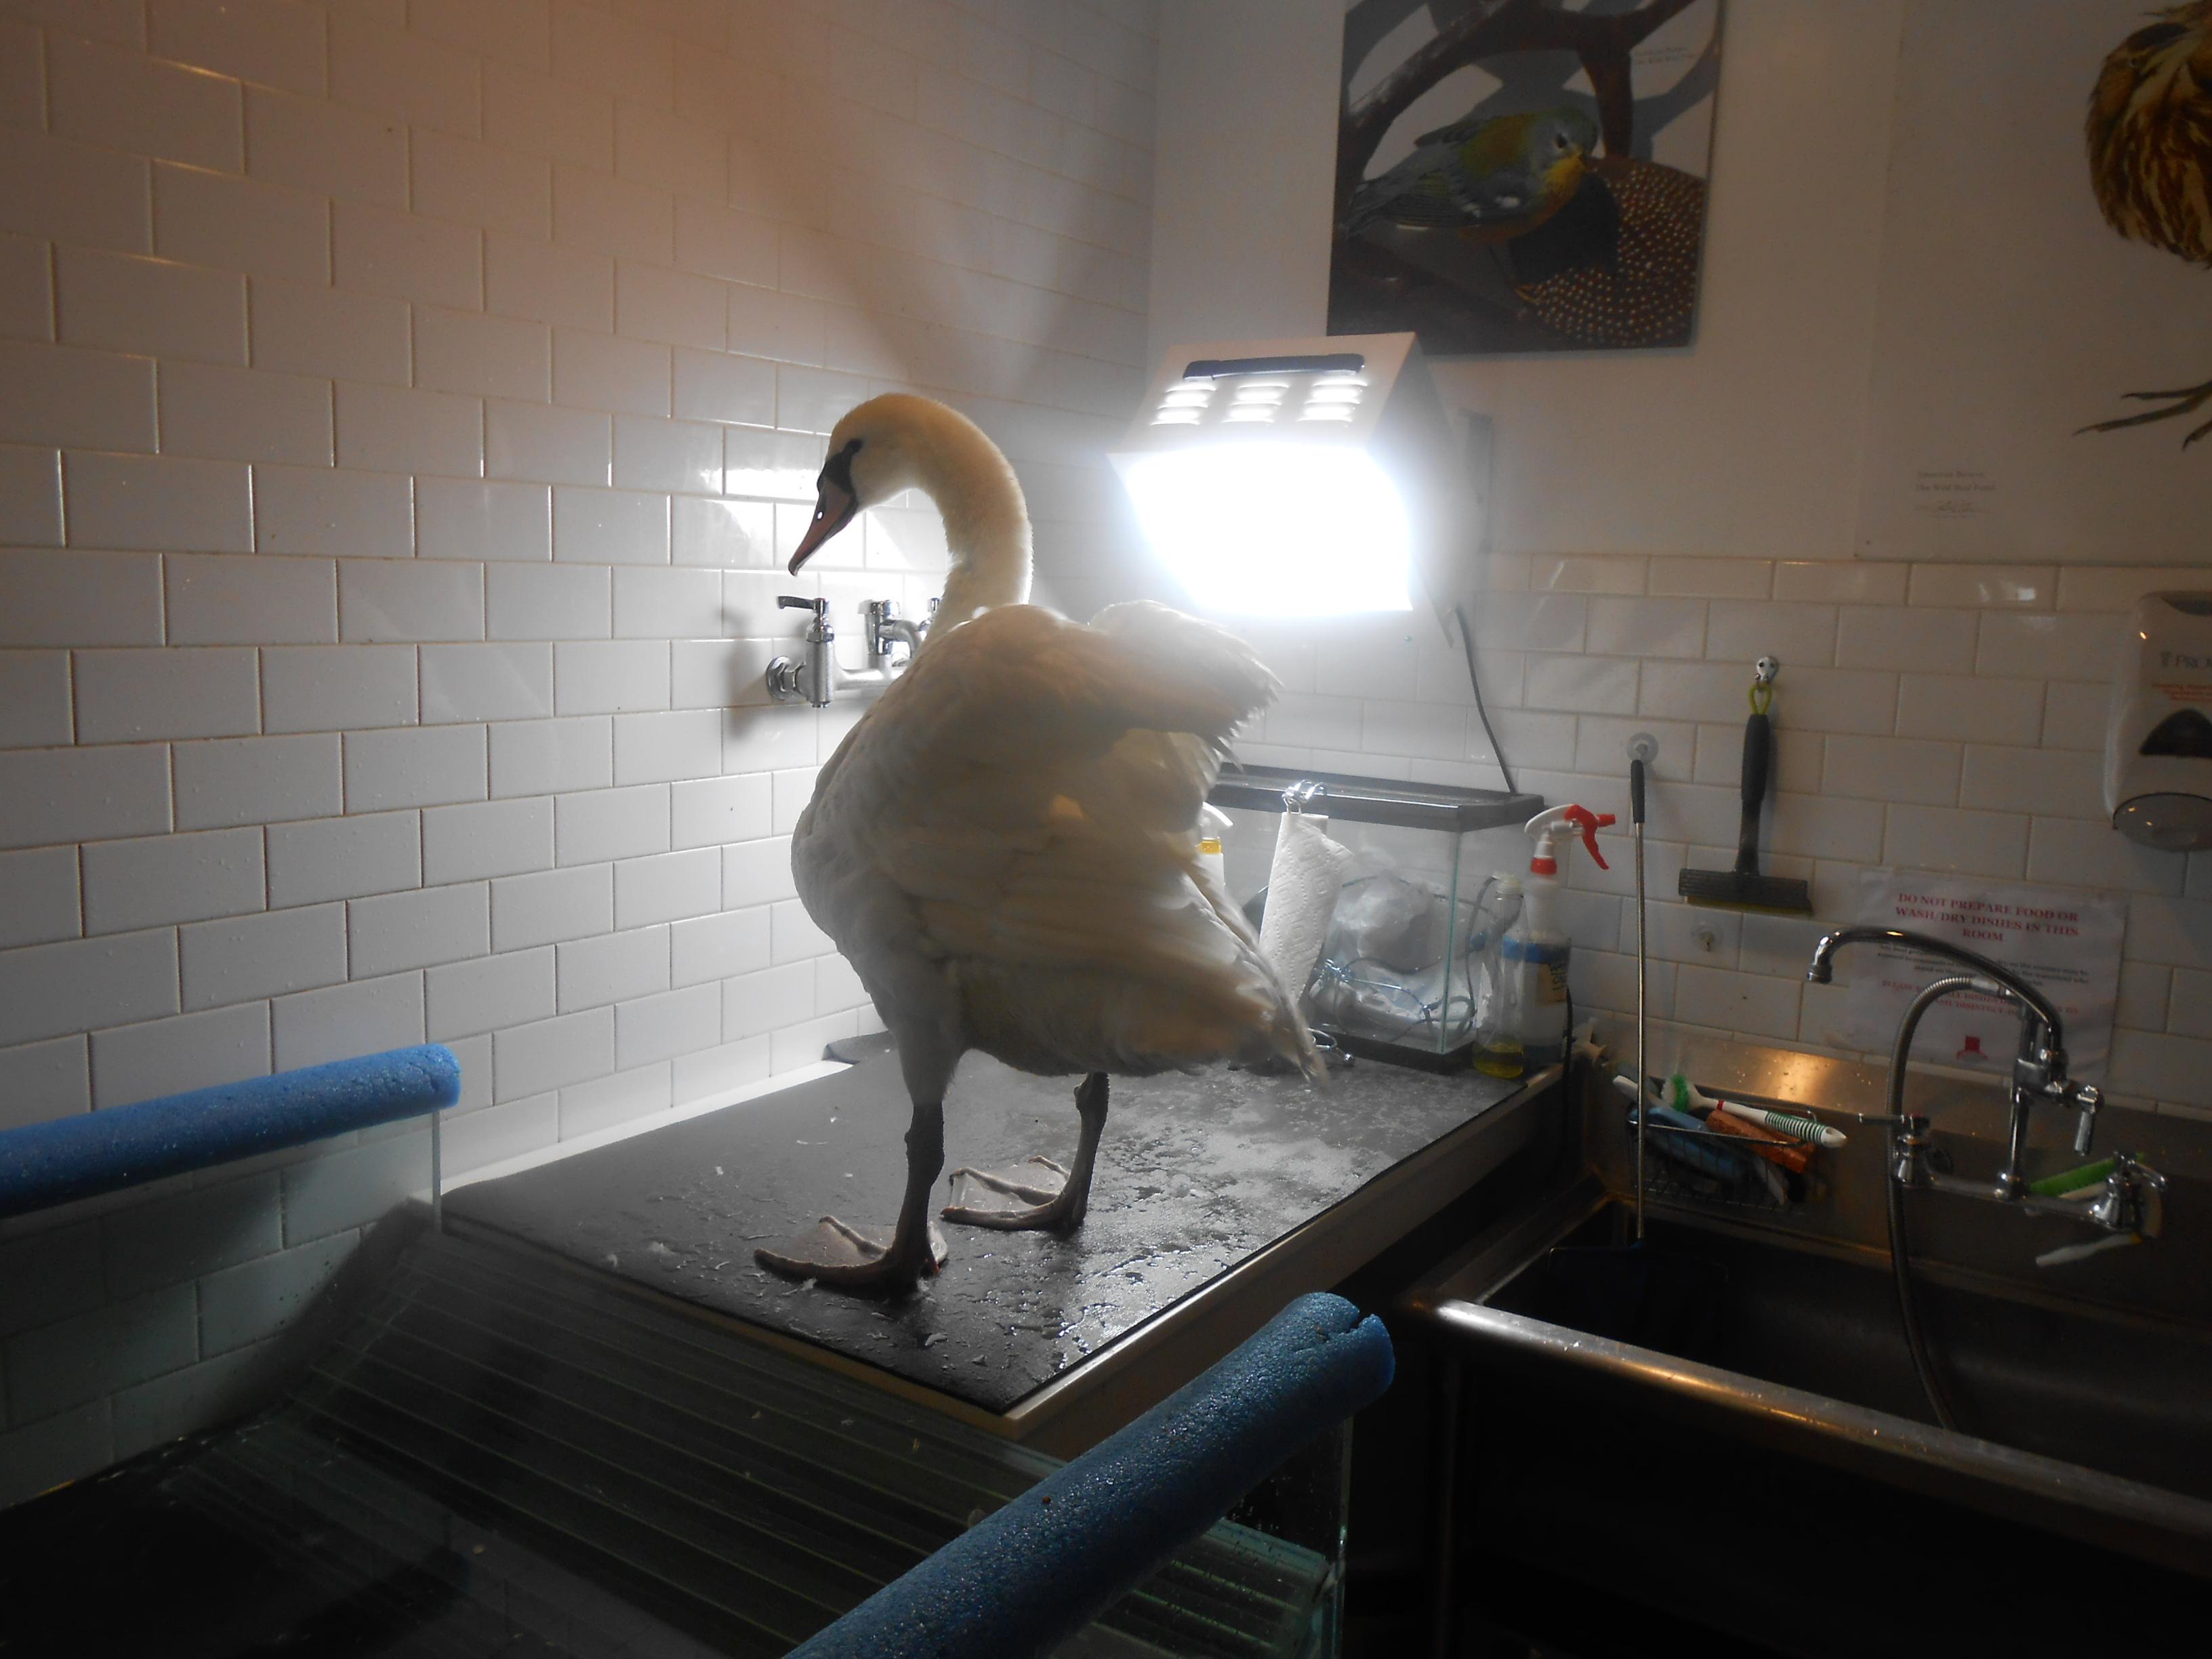 Vanessa the Swan at the Wild Bird Fund